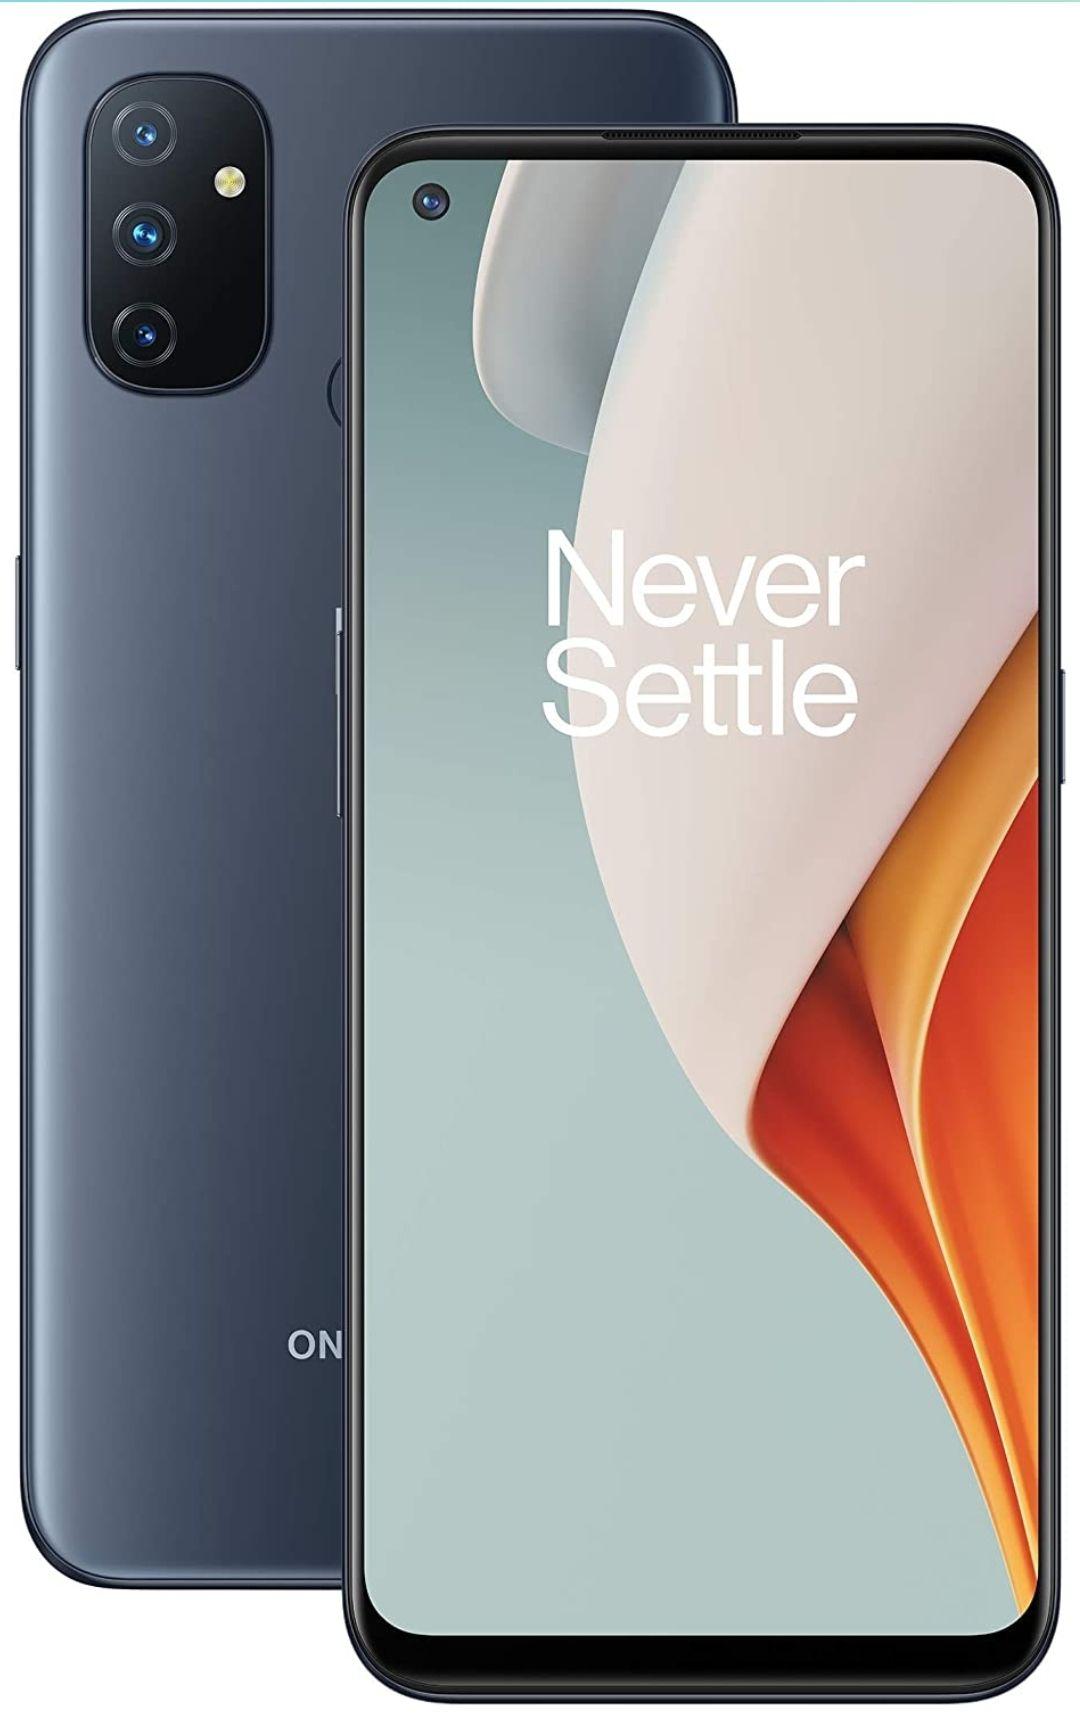 OnePlus N100 4G 4GB RAM 64GB Dual SIM 5000 mAh Battery - Midnight Frost Smartphone - £109.99 + £10 Top Up @ Three